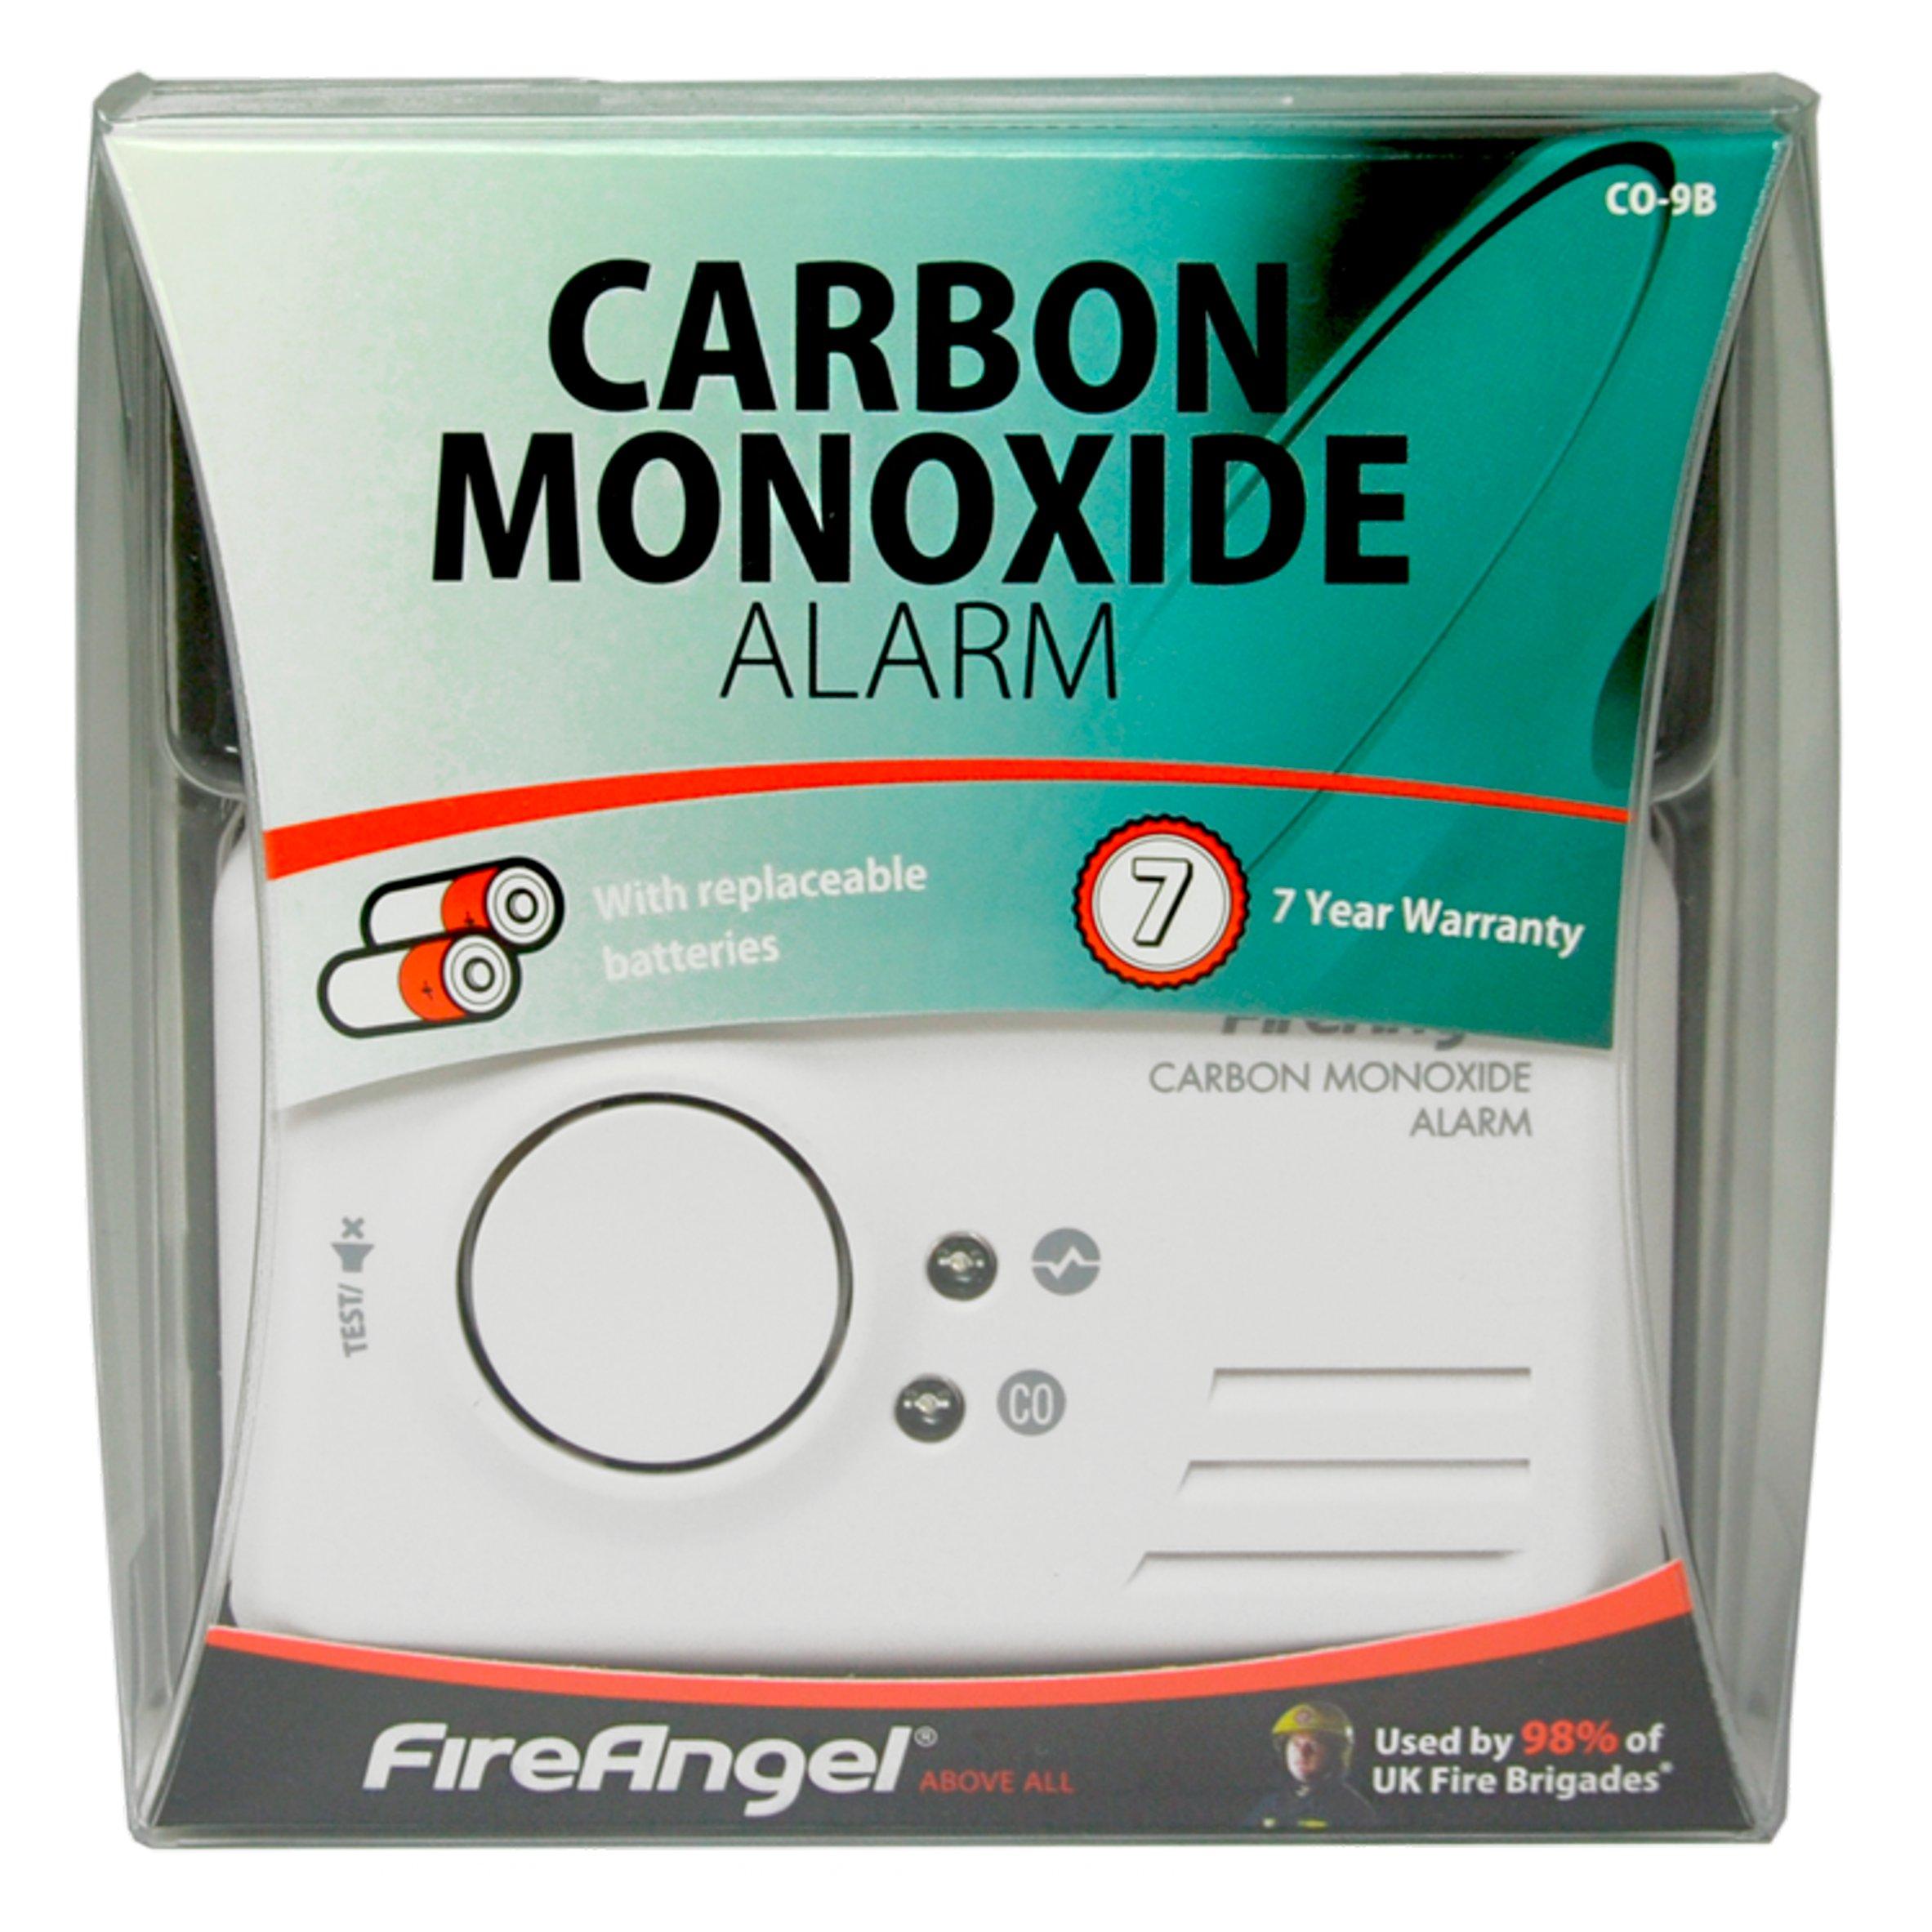 2 Pack White Fireangel CO-9B Carbon Monoxide